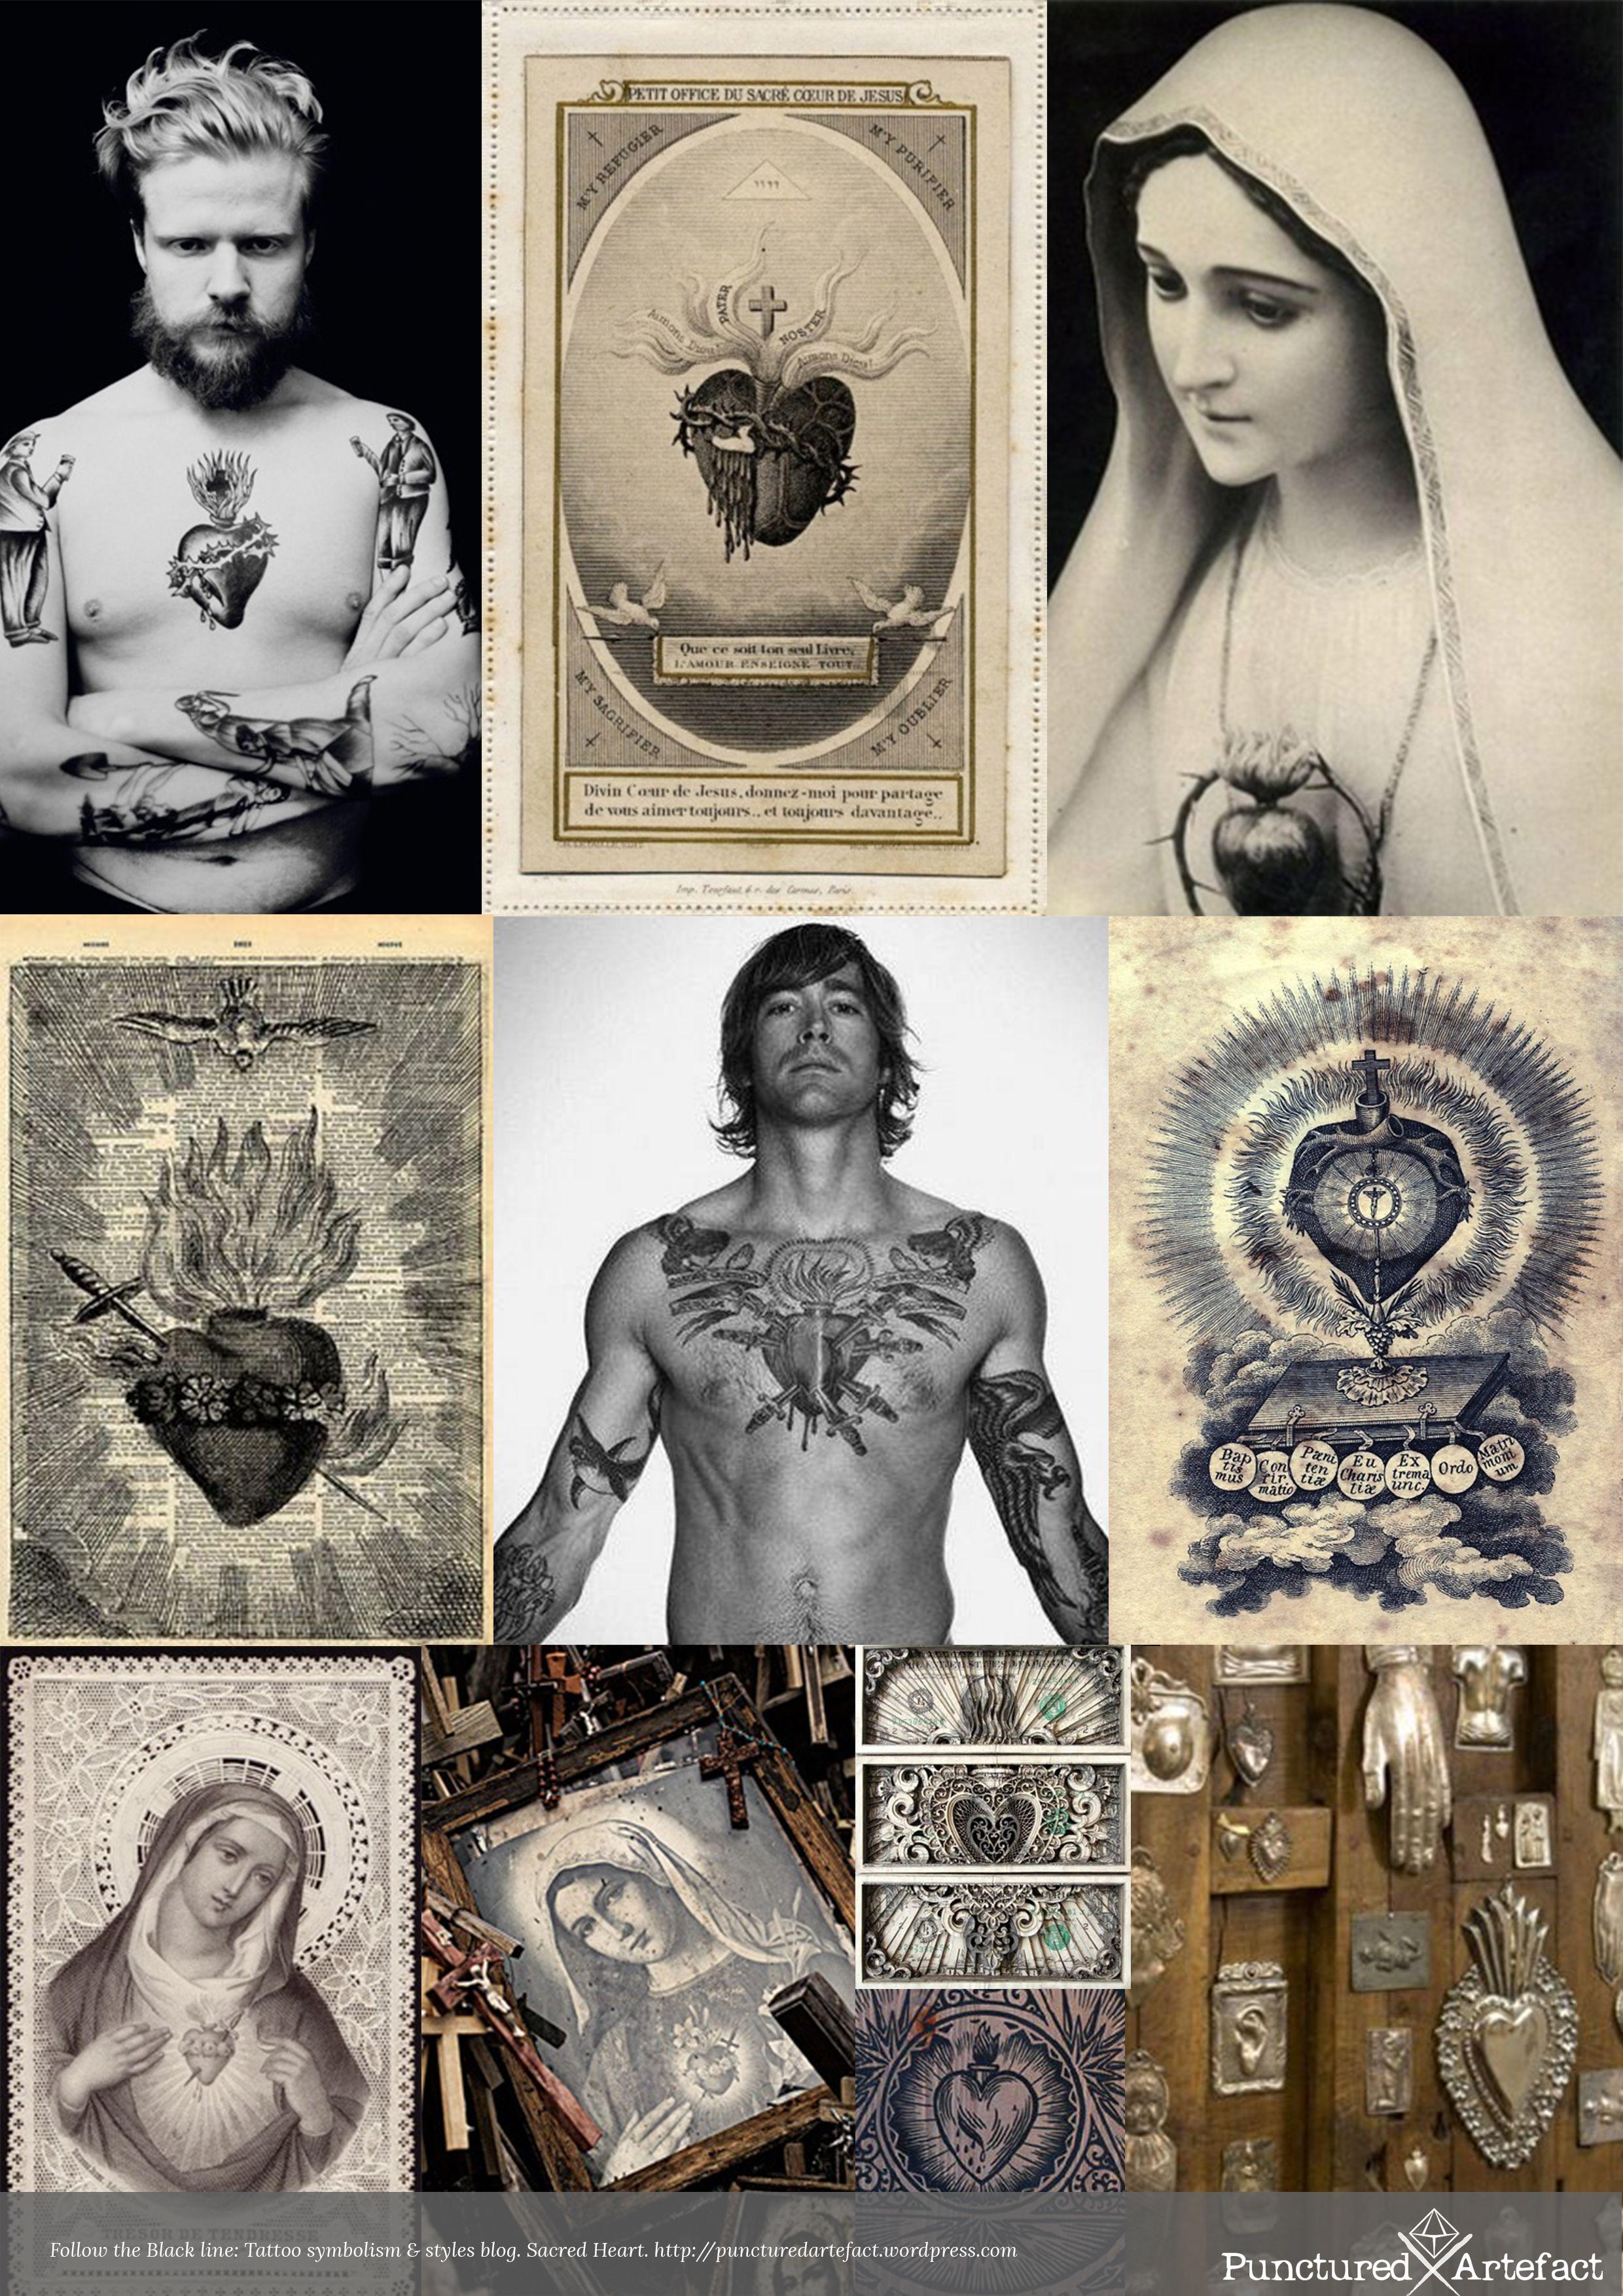 http://puncturedartefact.wordpress.com/2013/11/19/symbolism-sacred-heart-tattoo-design-art/  Blog